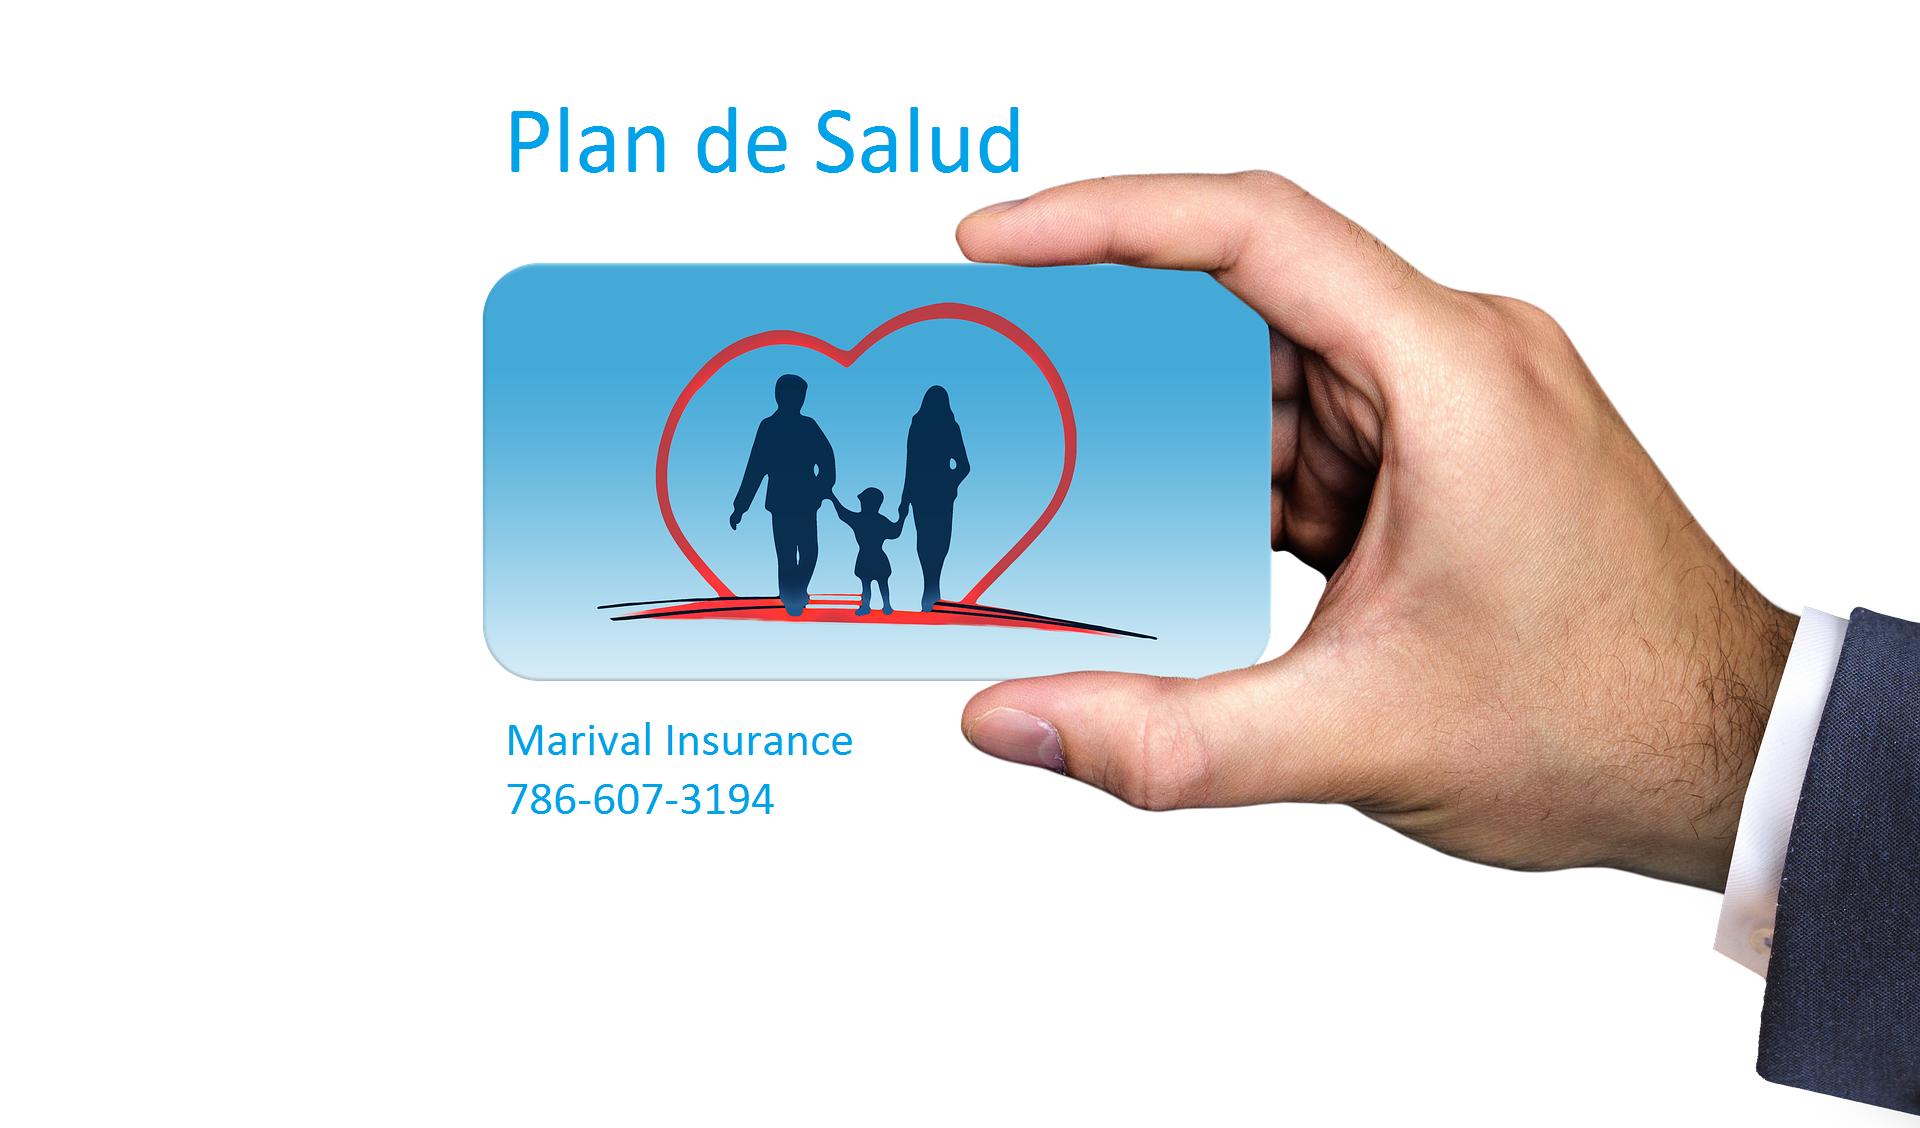 Planes de seguro médico   cobertura médica   anthem Plan de salud perfecto   Seguro médico, Salud, Perfecta